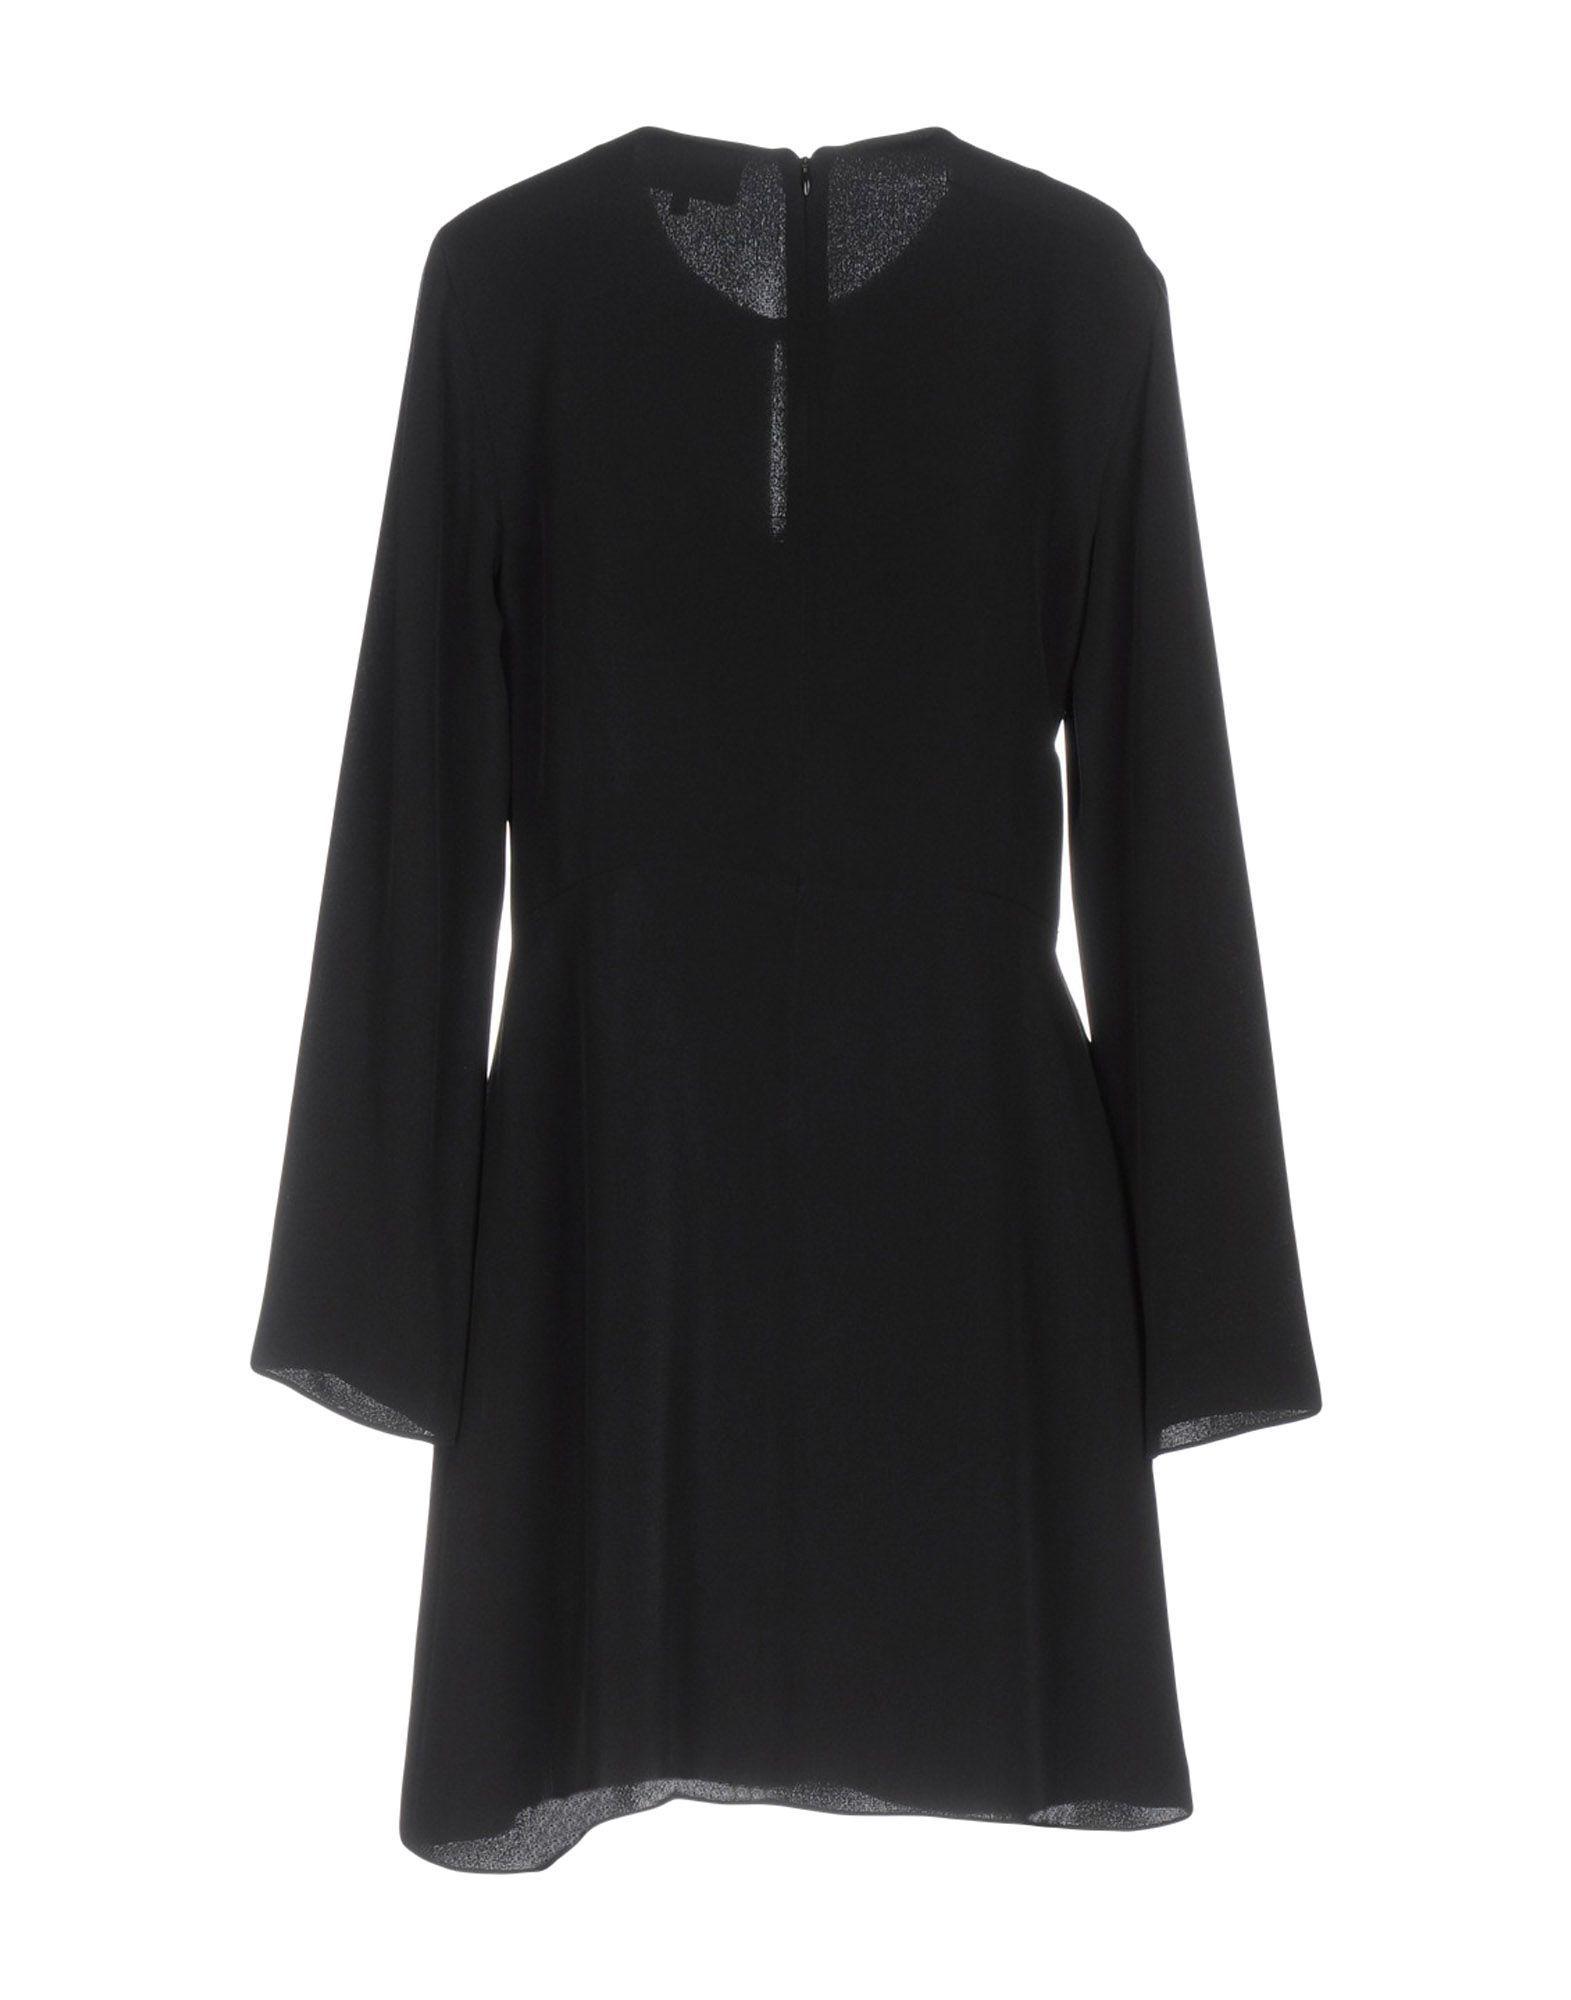 3.1 Phillip Lim Black Silk Long Sleeve Dress